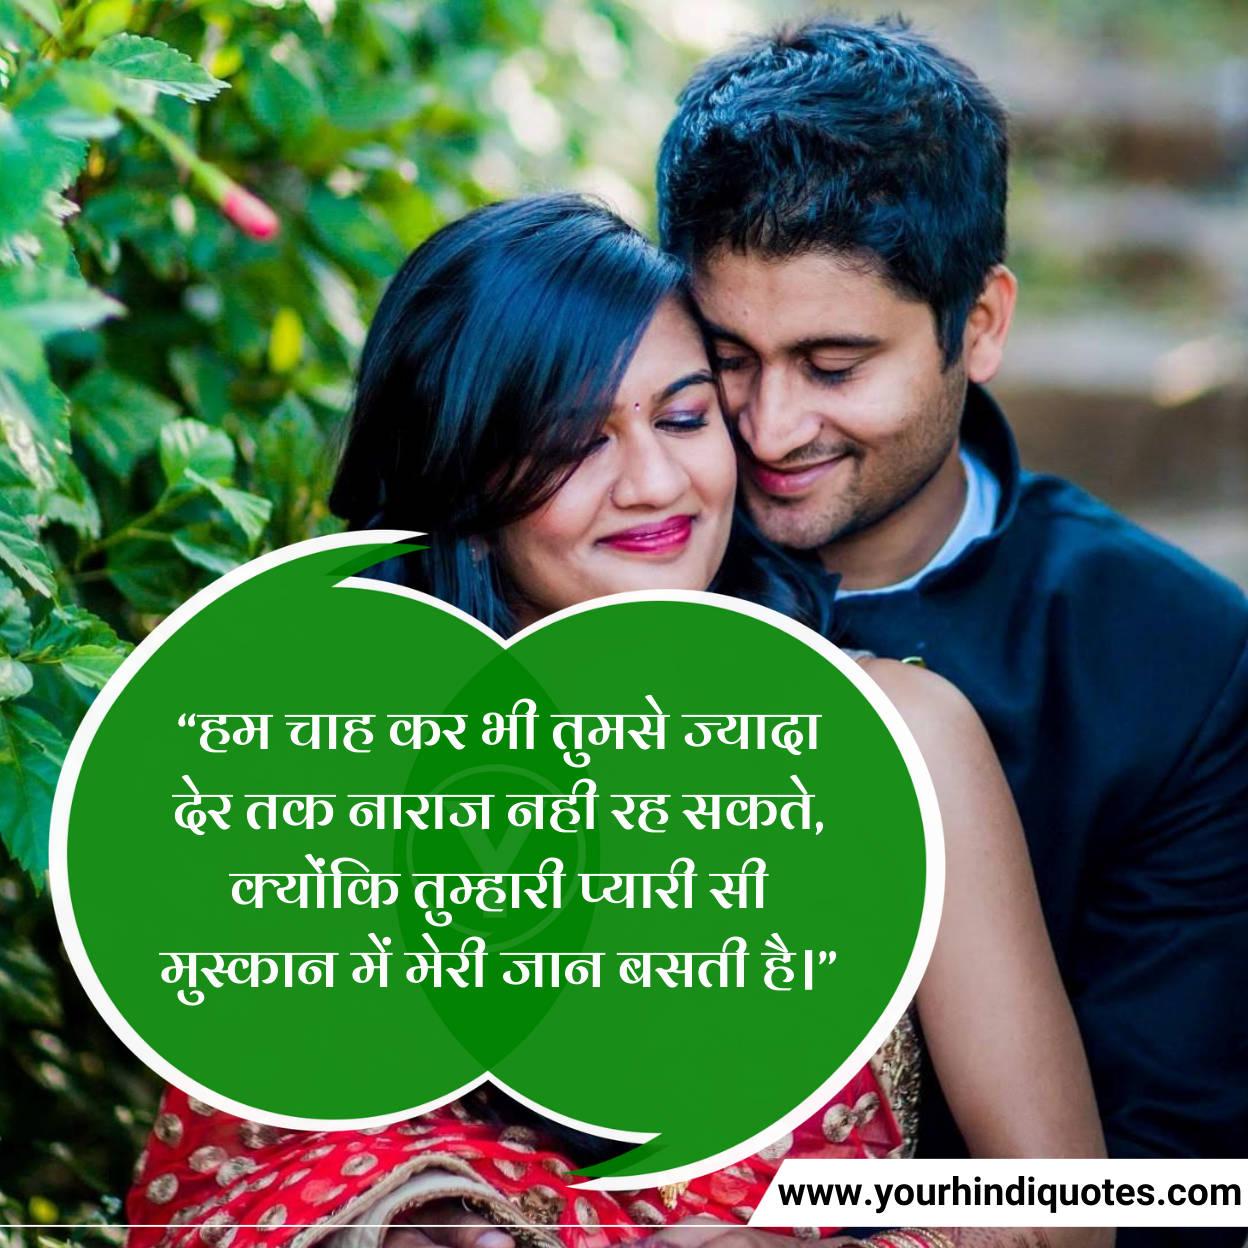 Pyar Shayari Images